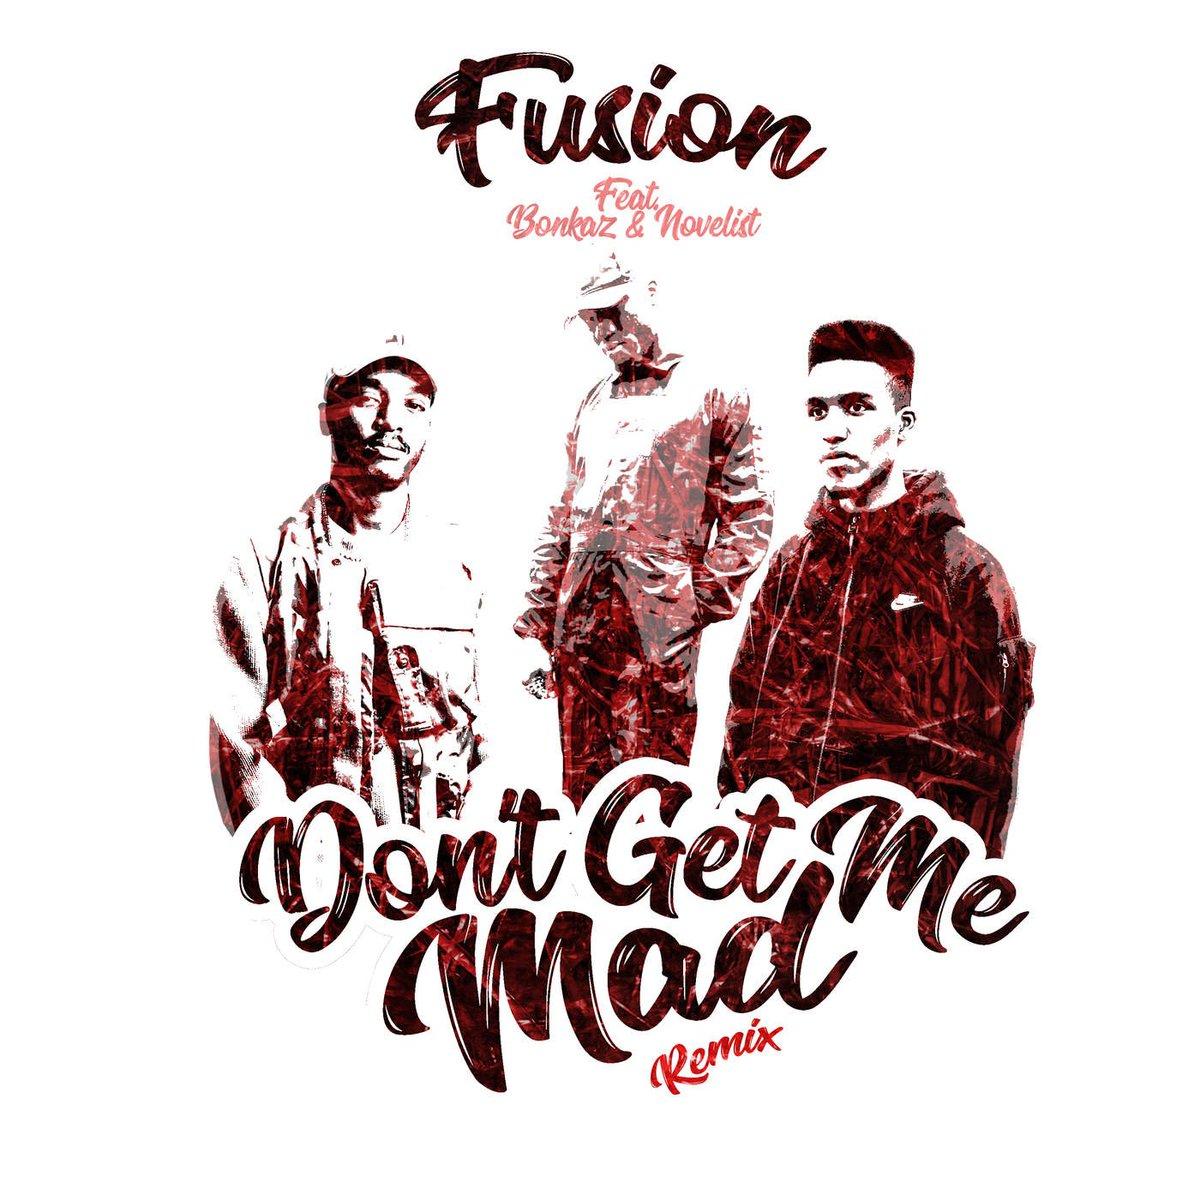 #NEWTrackAlert!!! @Fusion_IAS – Don't Get Me Mad – The Remixes. Rapper gets @Bonkaz, @Novelist, @ajtracey, Elf Kid, Blakie and Big Zuu on the three remixes of his single #DGMM  https:// buff.ly/2mPY5mn  &nbsp;  <br>http://pic.twitter.com/BmbwPXGJtT